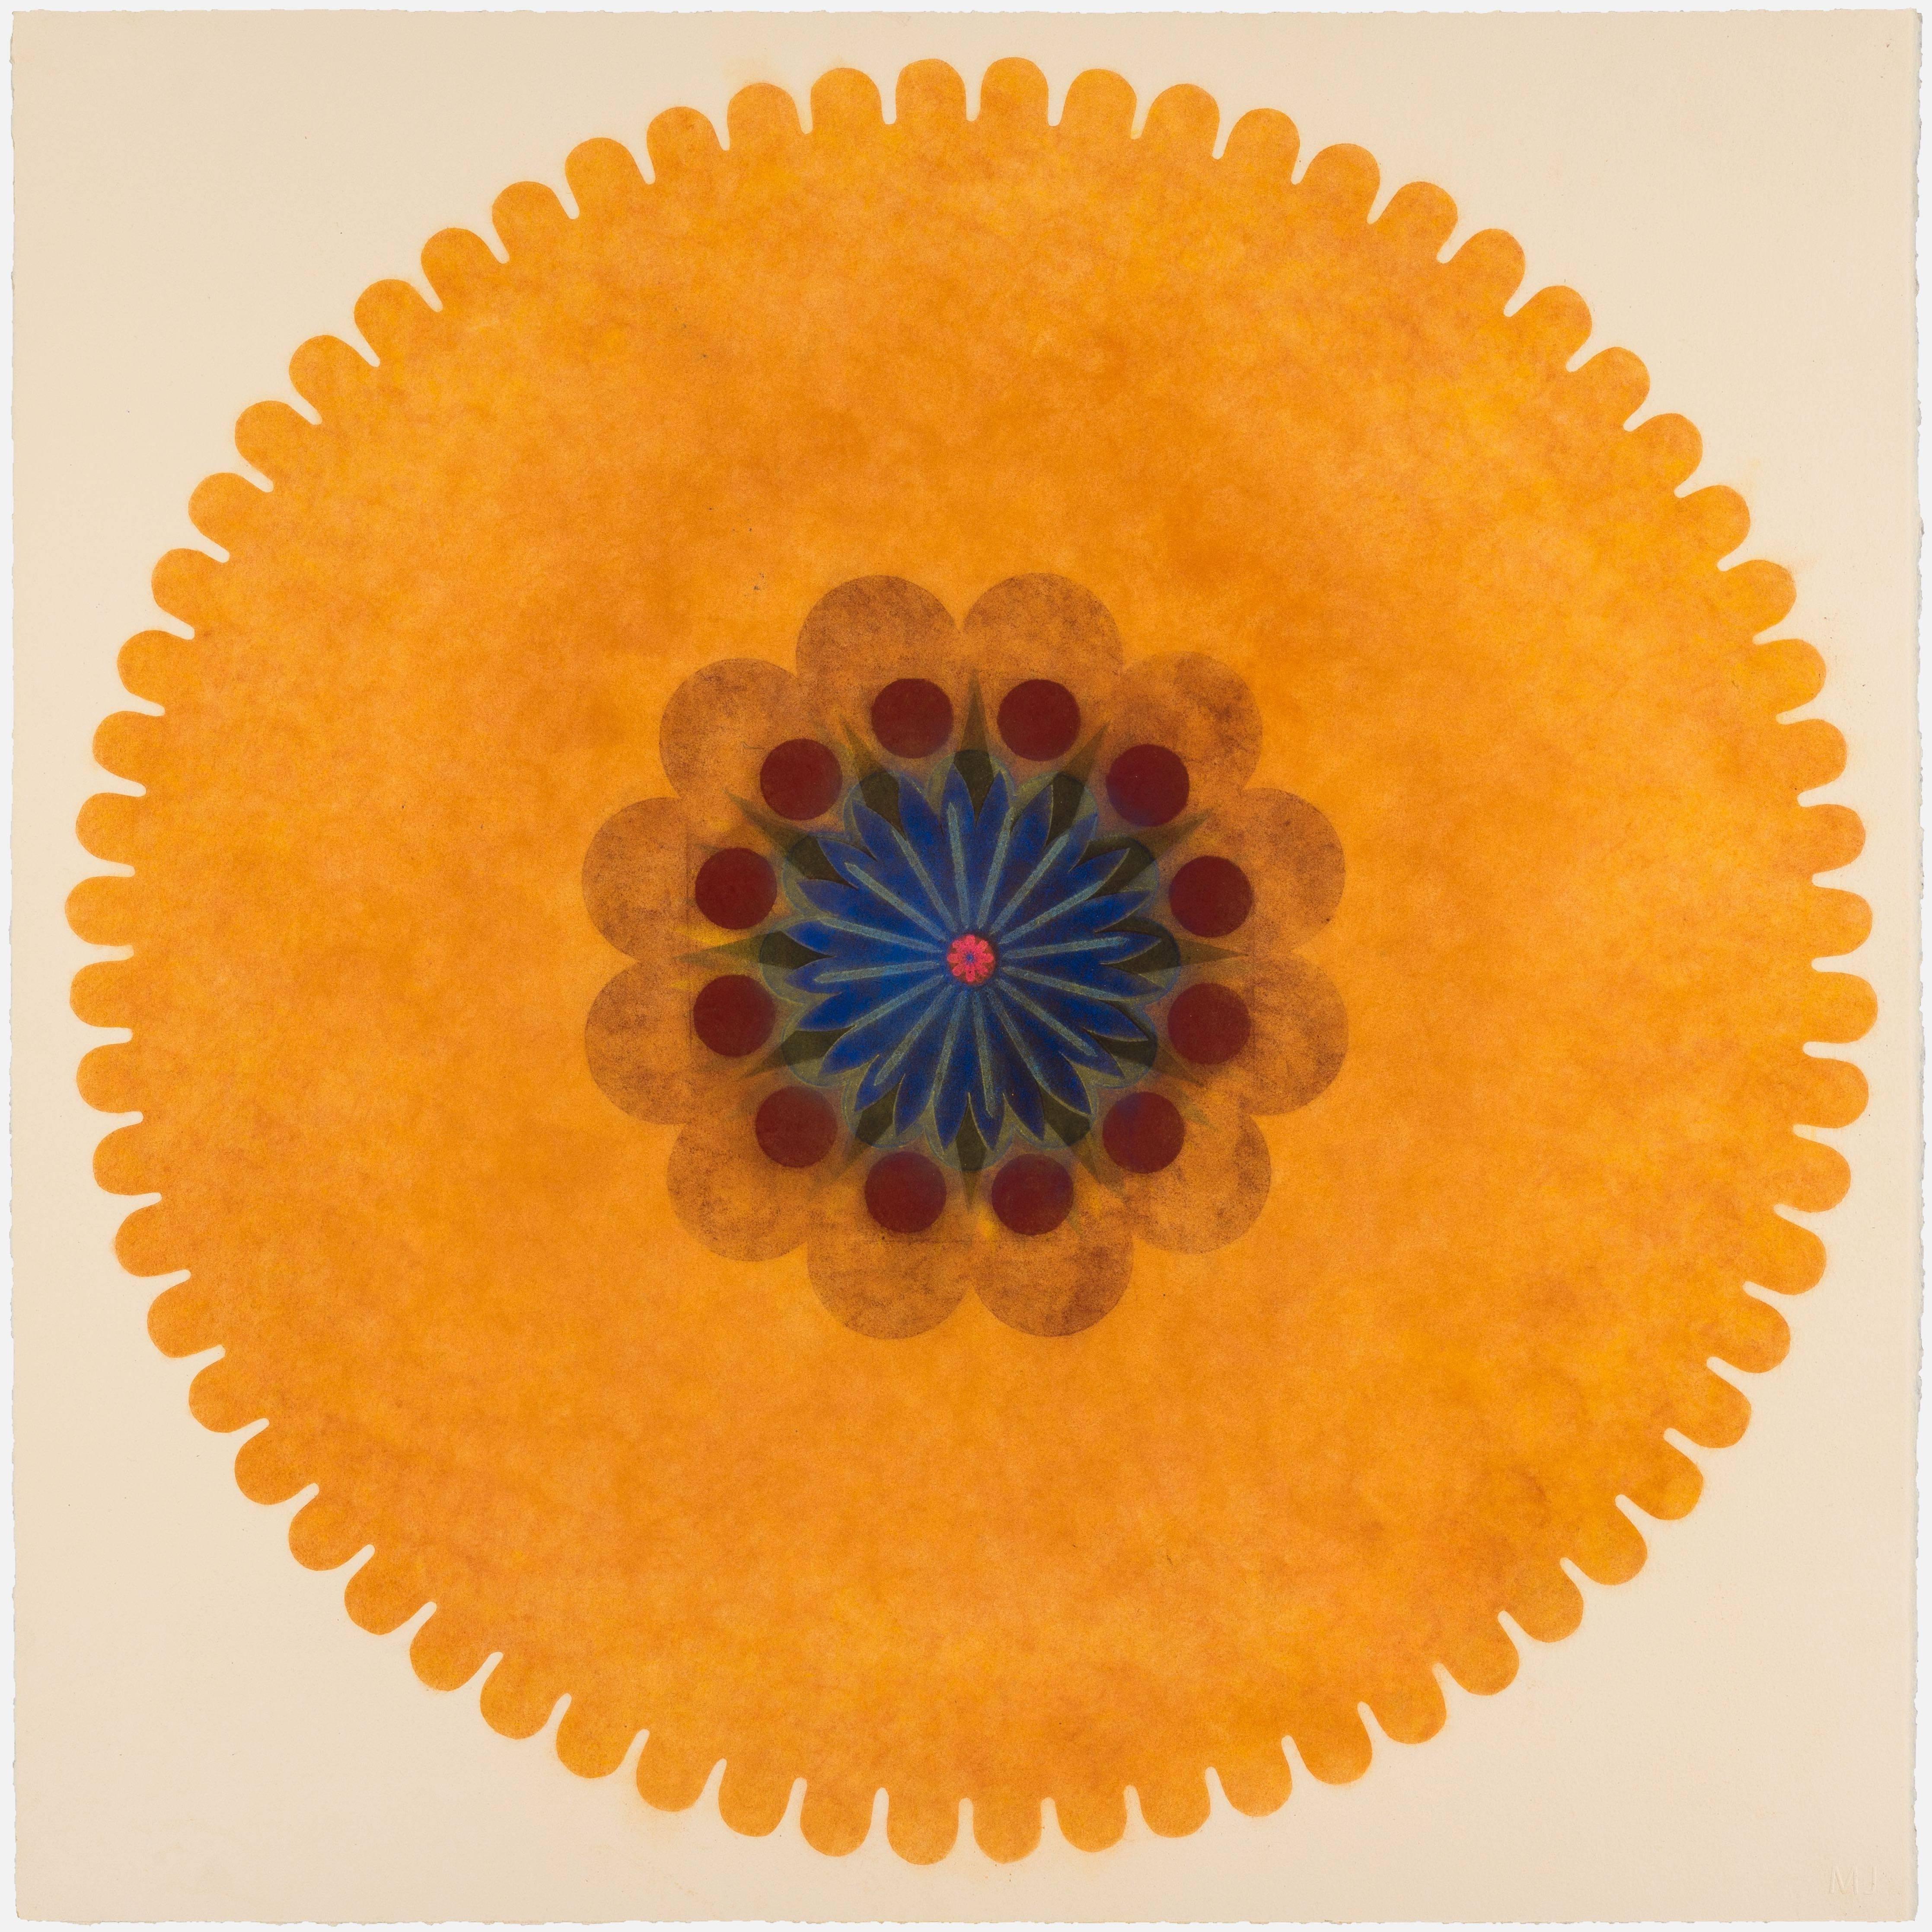 Pop Flower 43, Bright Orange Mandala, Green, Maroon, Blue Center